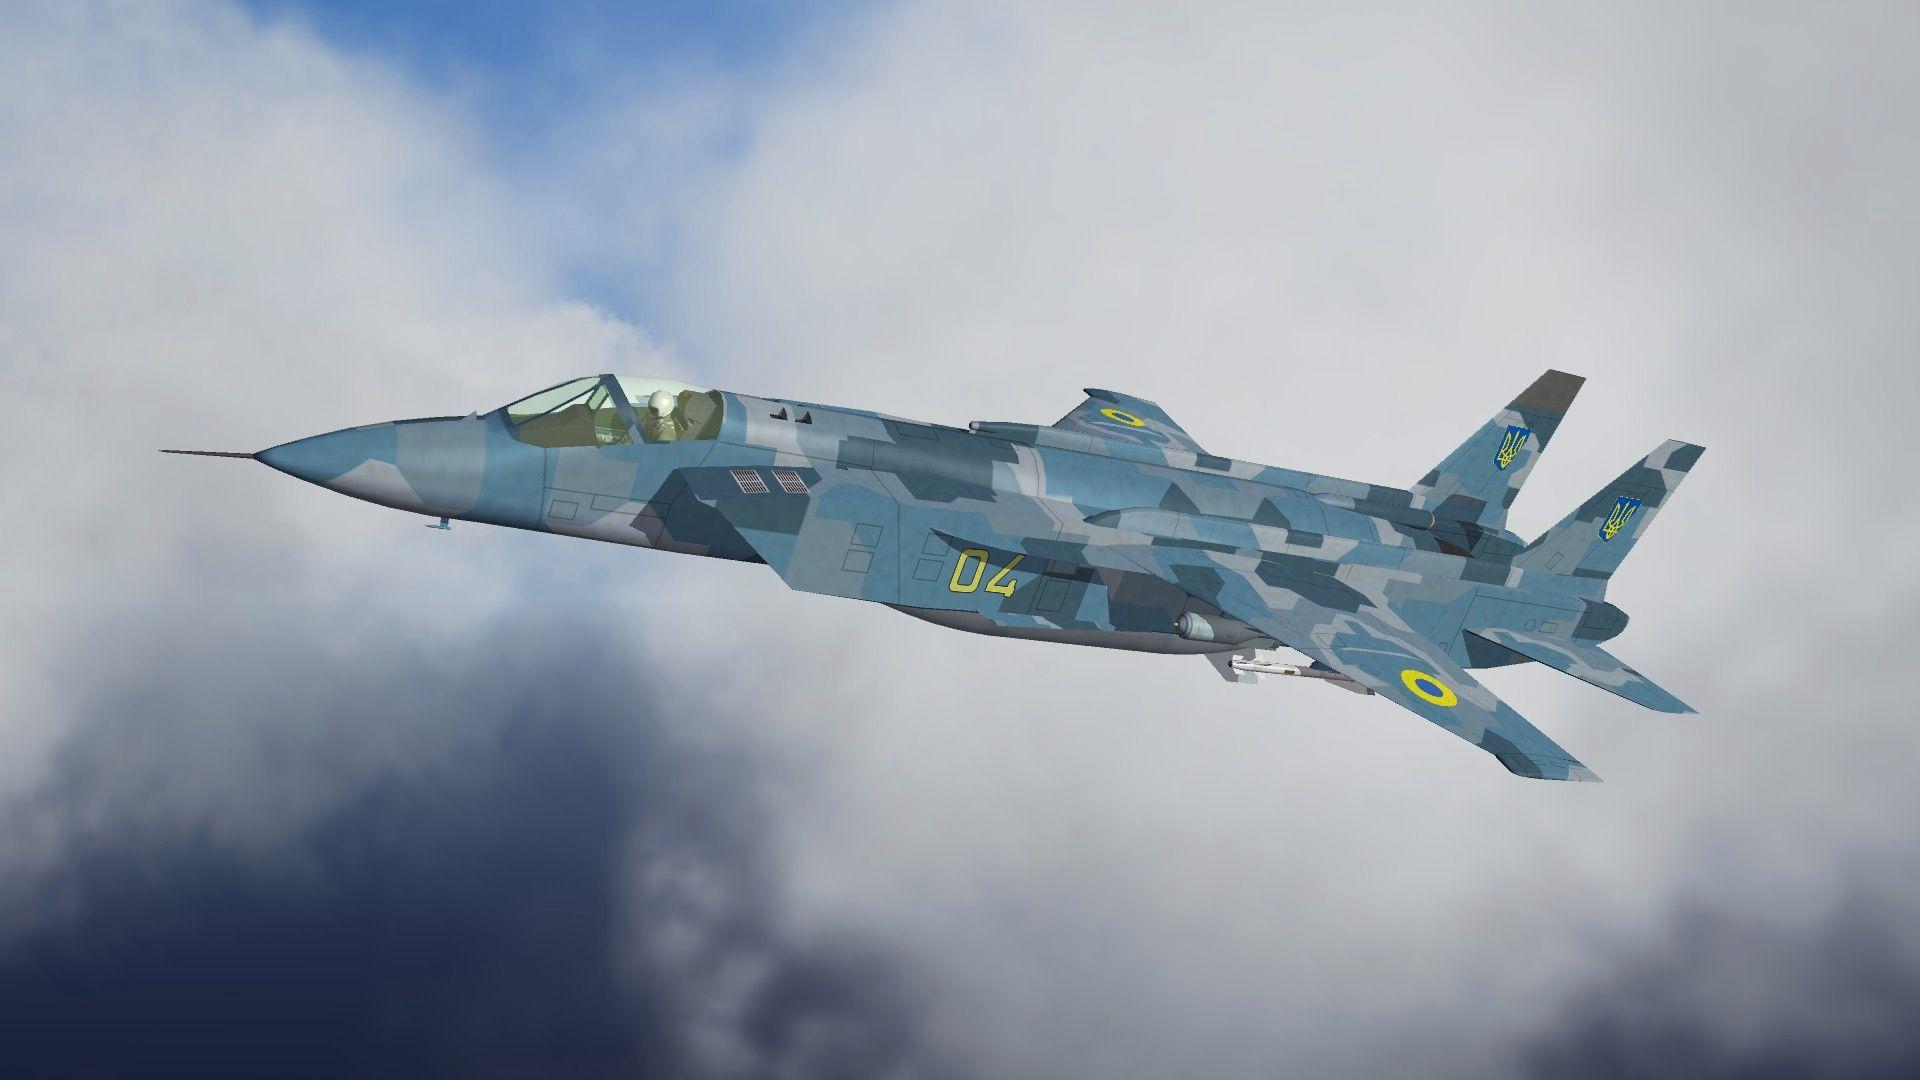 UKRAINEYAK-41FREESTYLE01.jpg